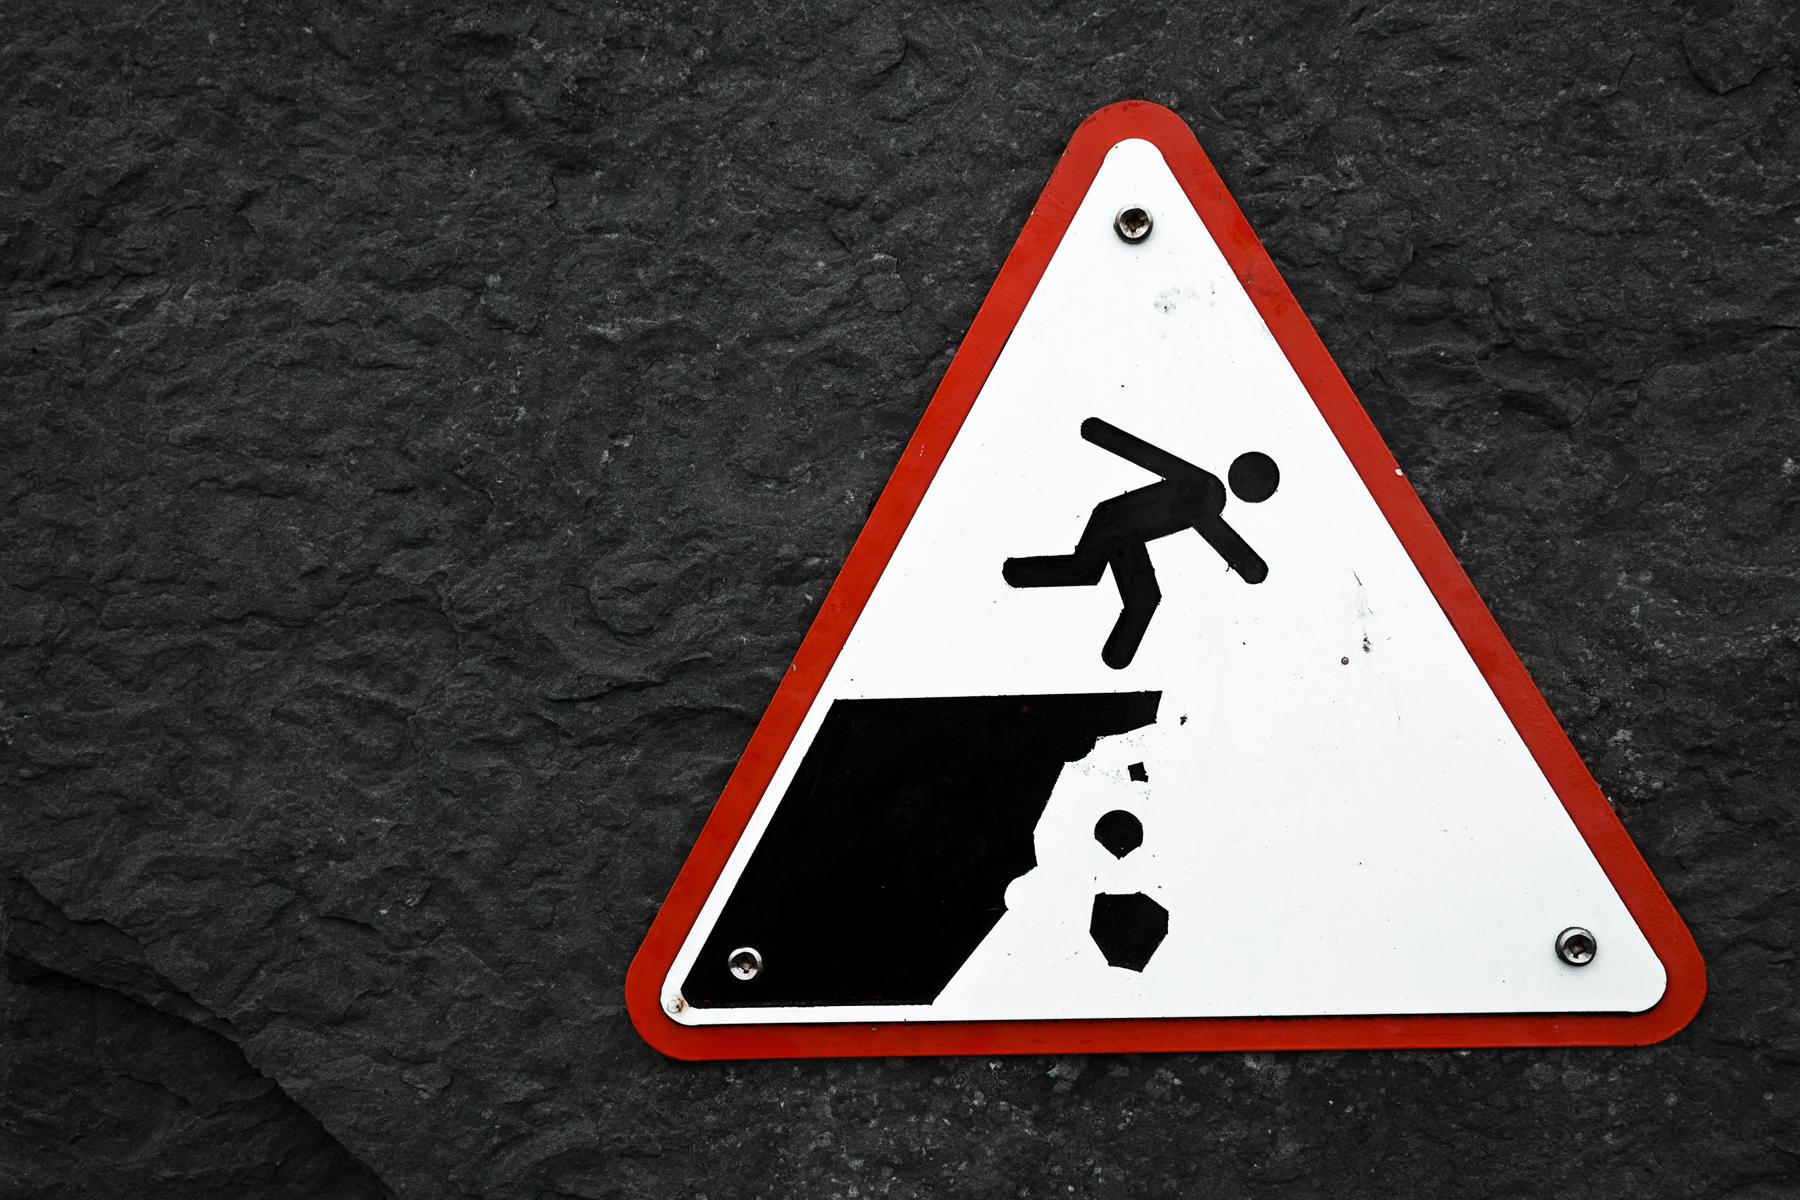 Cliff drop warning sign photo